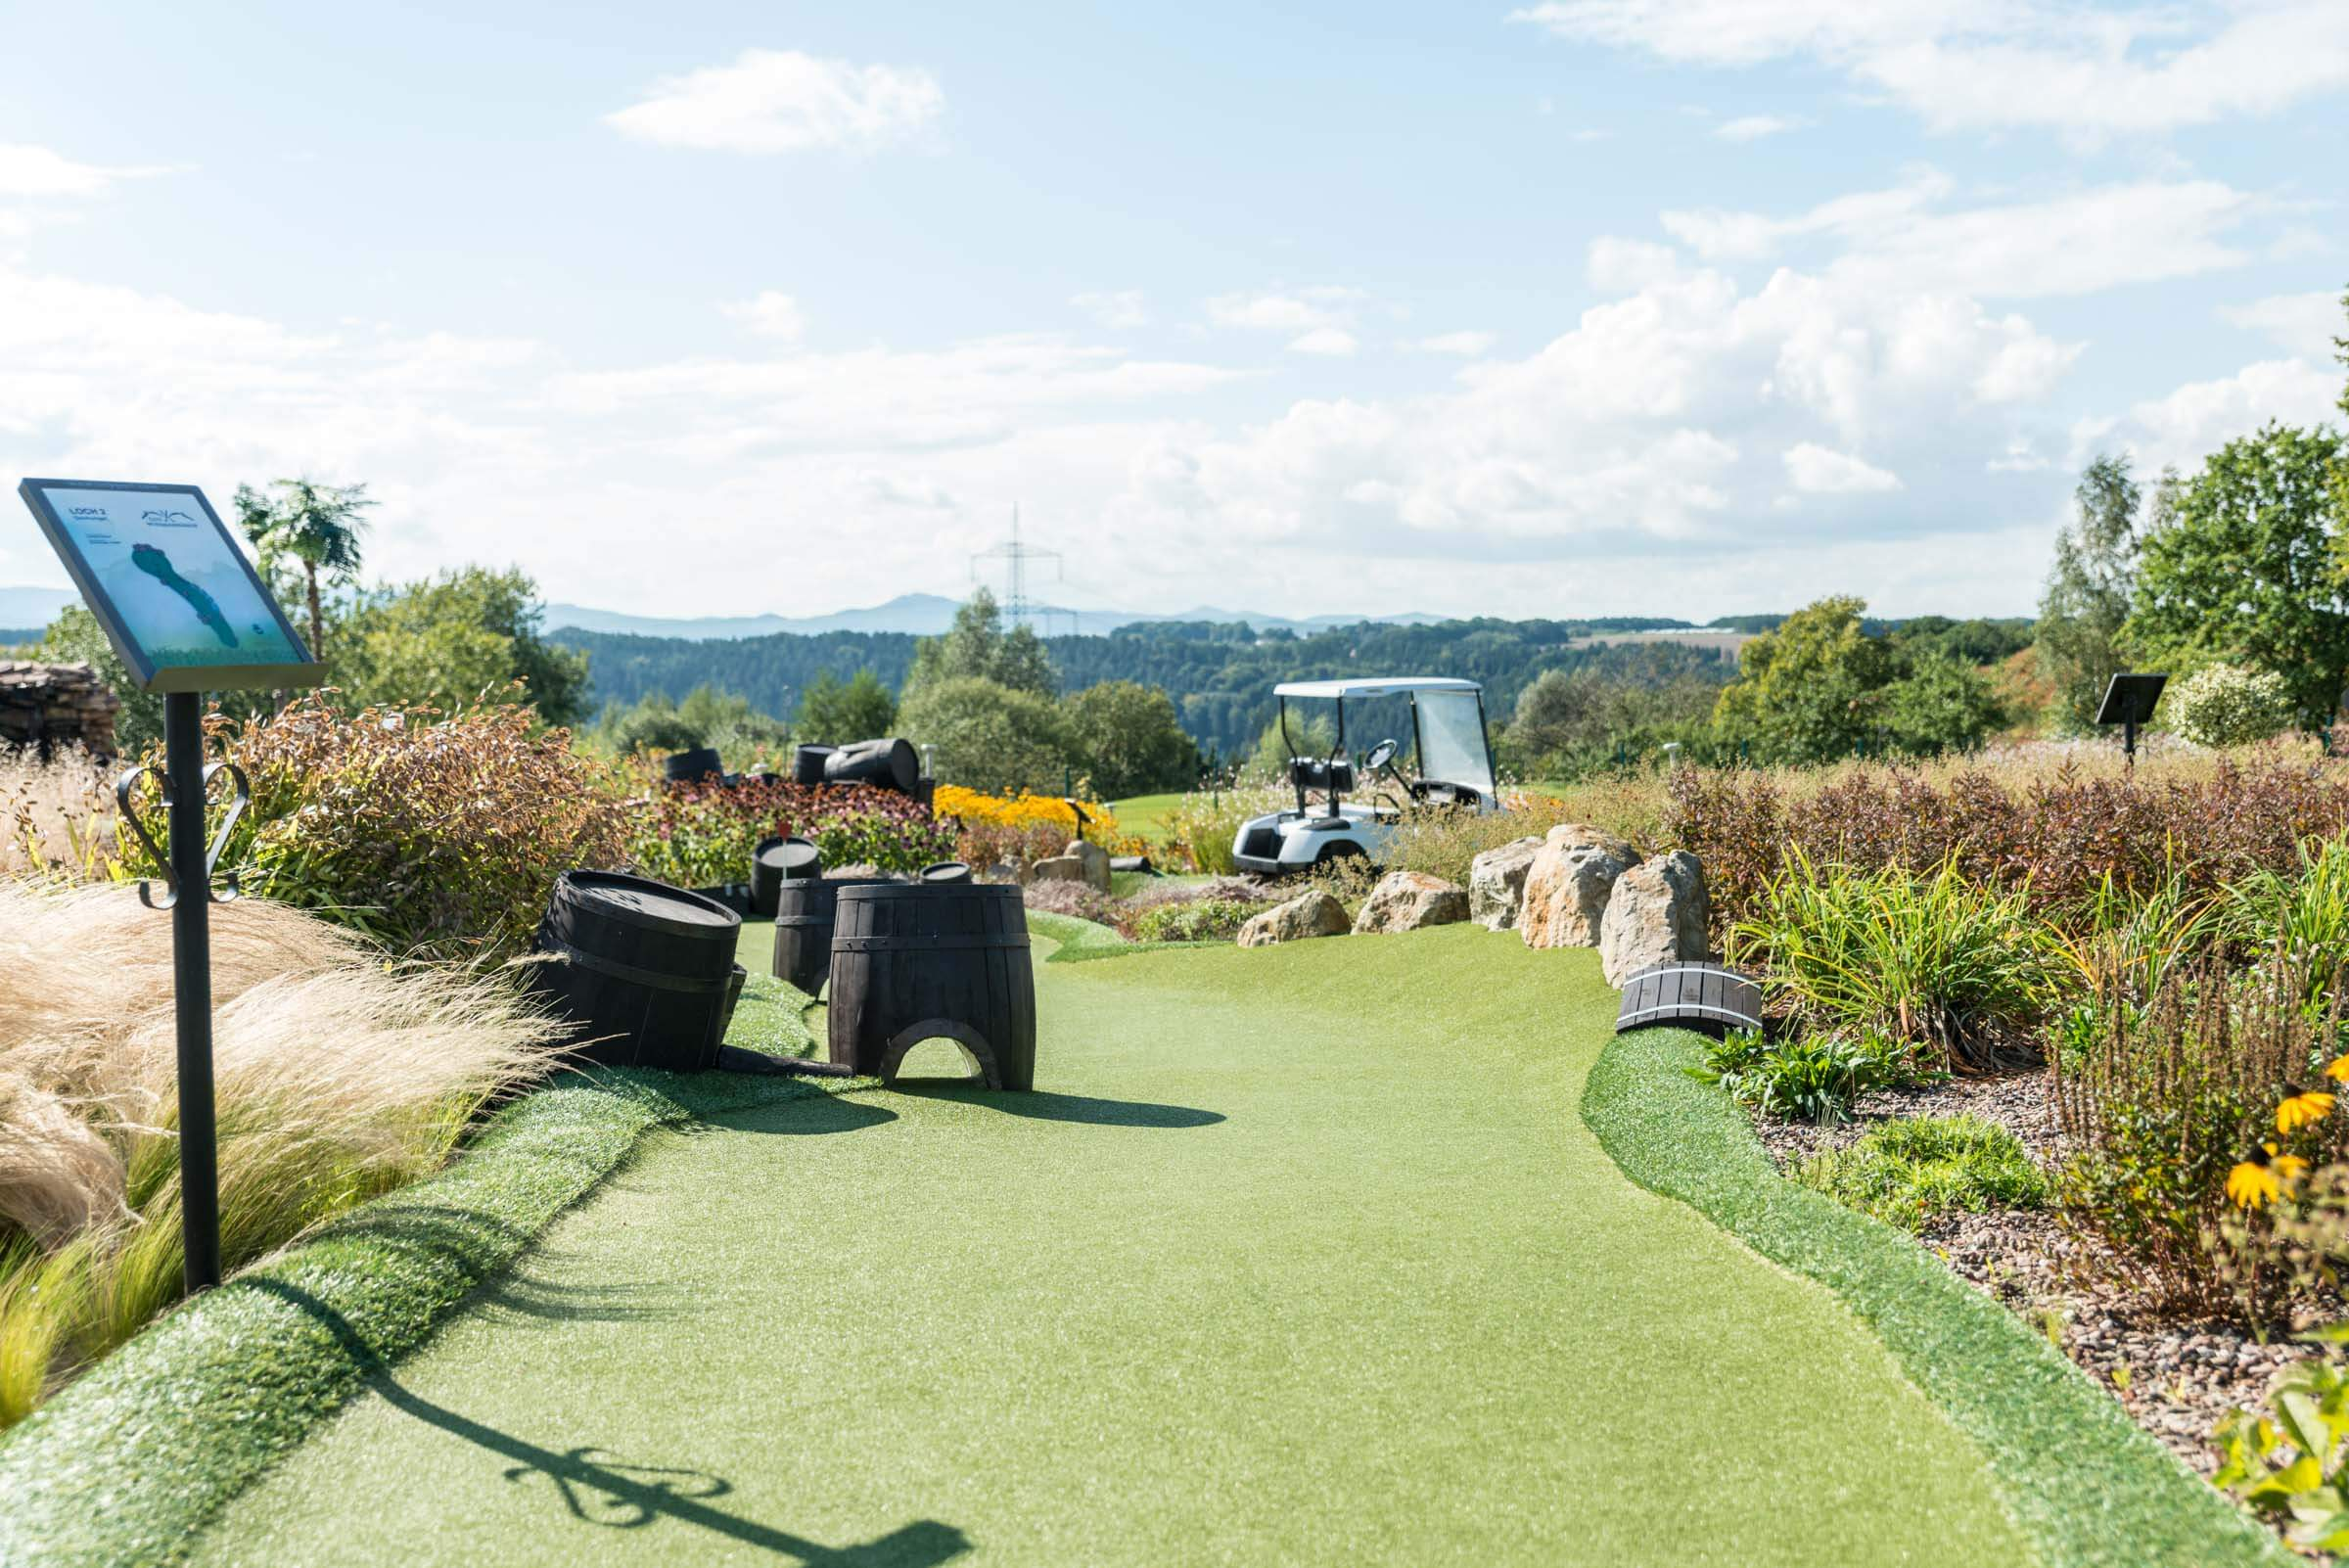 Adventure Golf Spielbahn